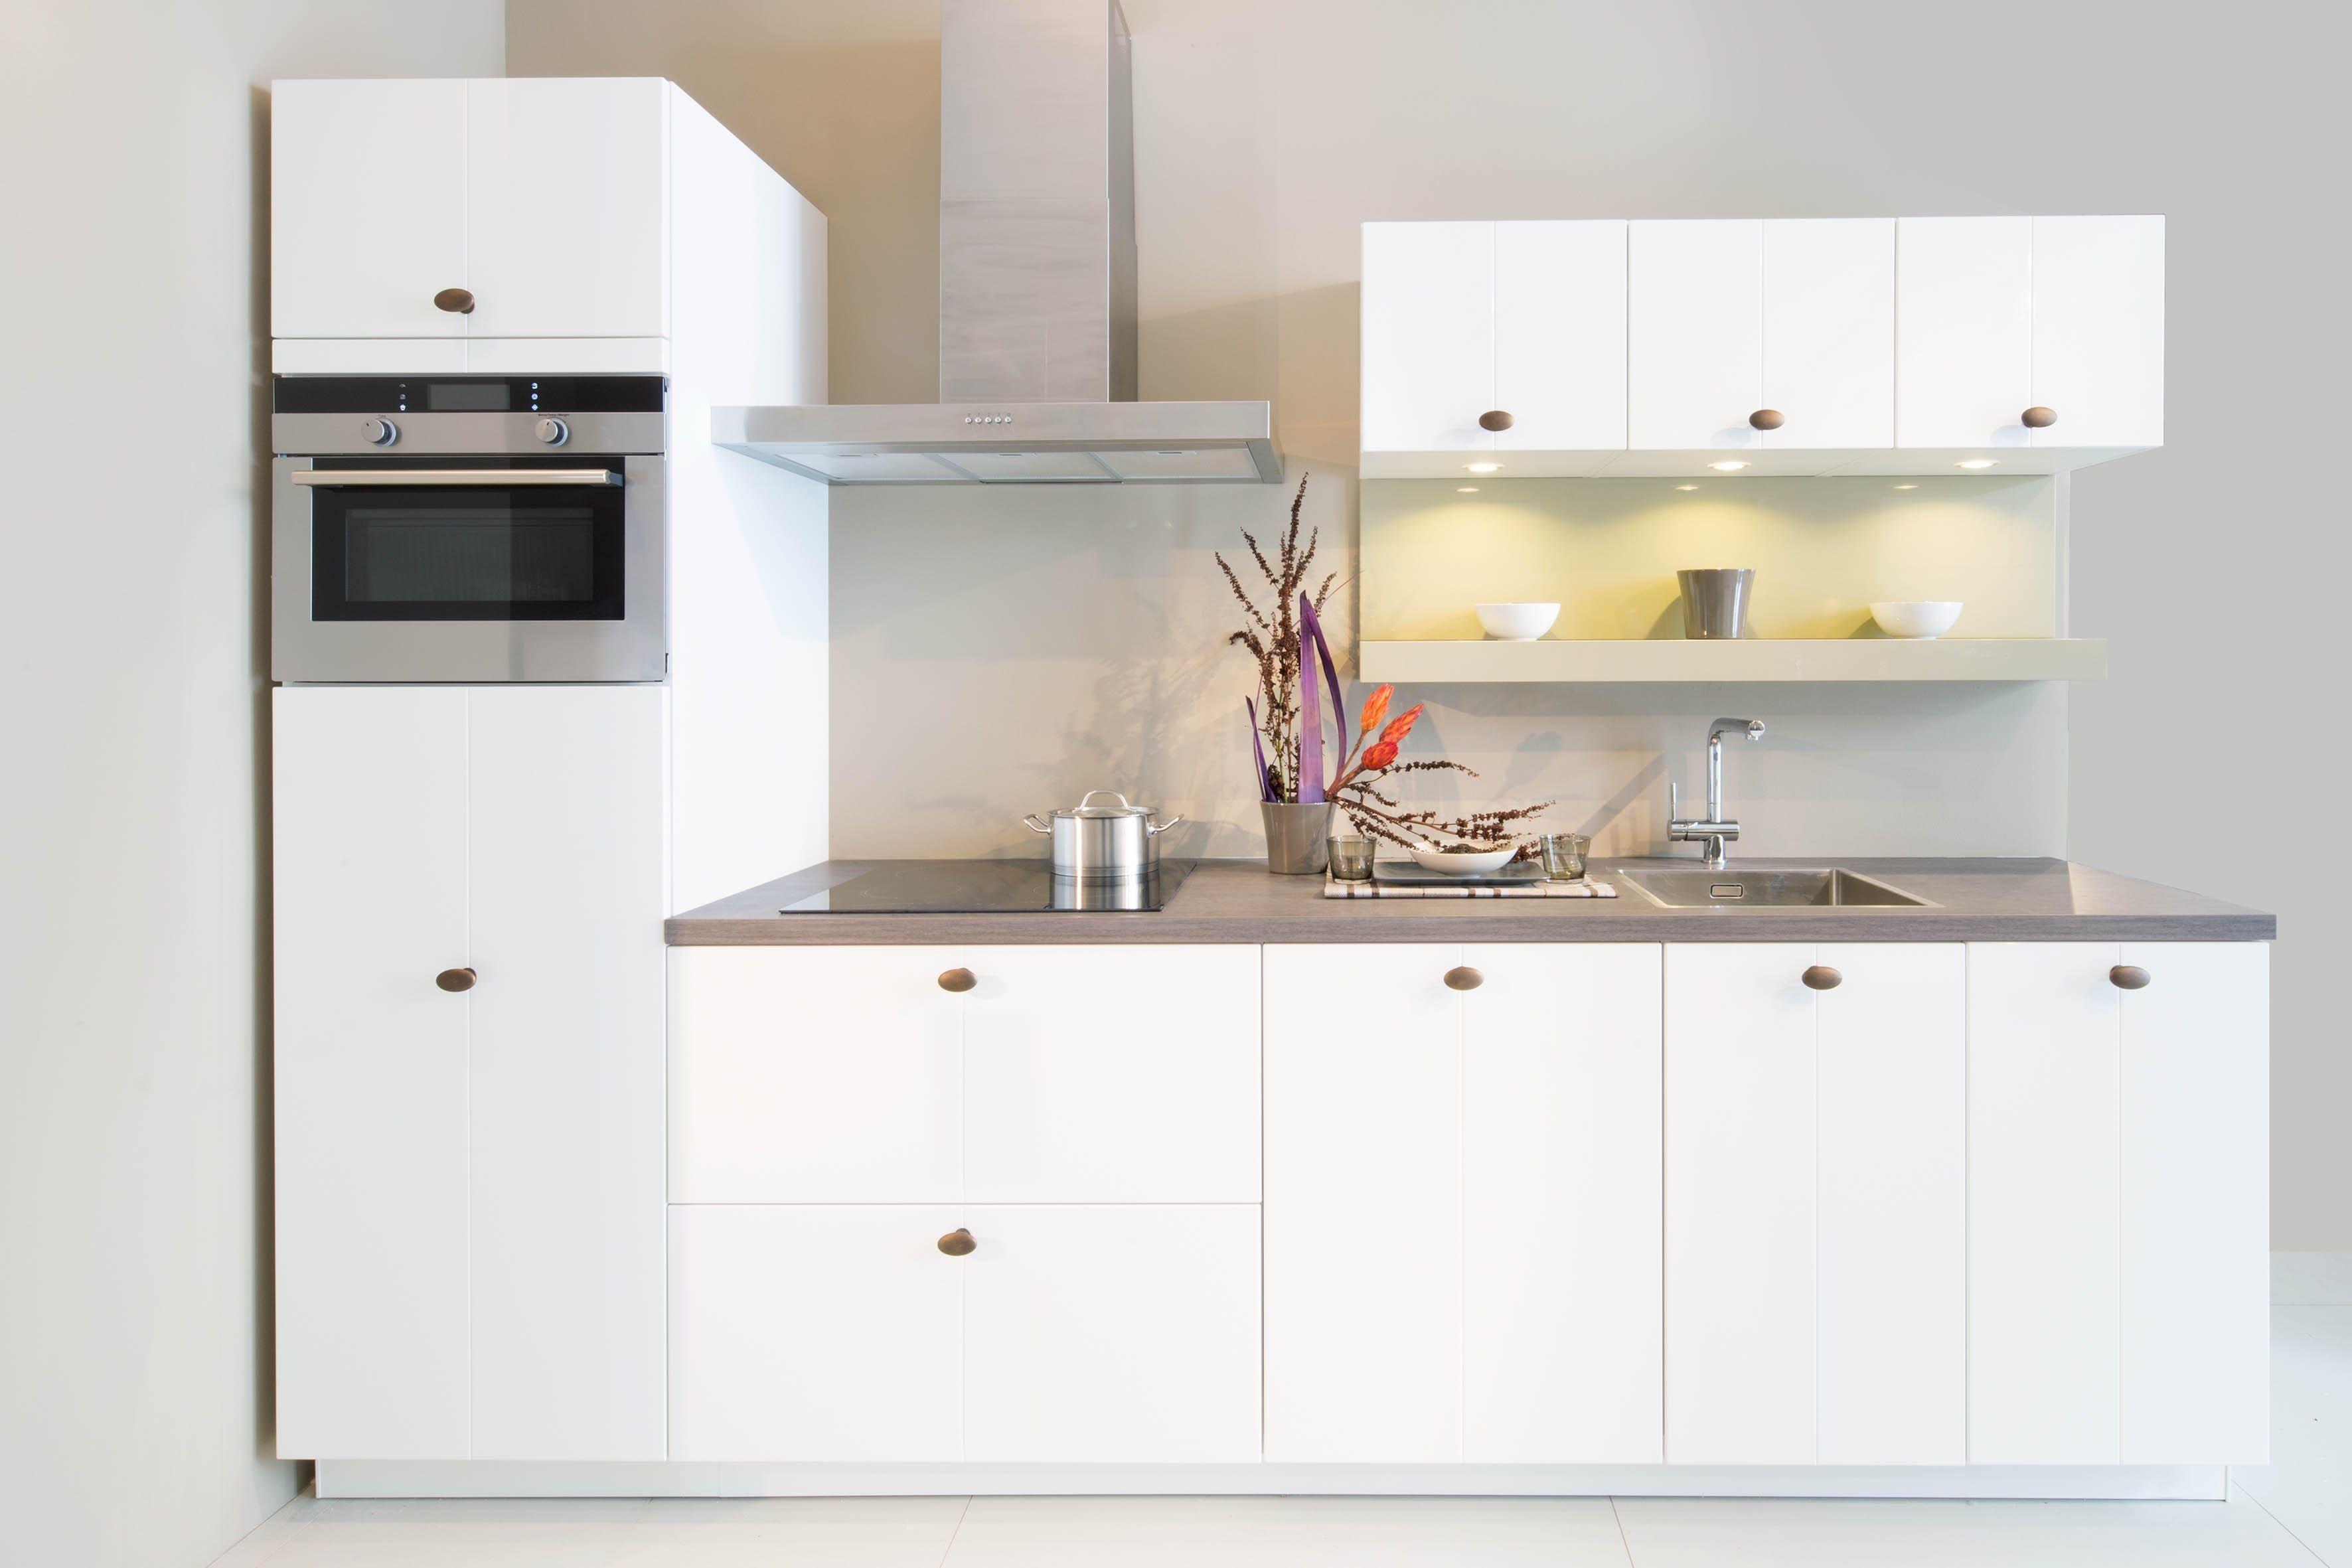 Eigenhuis Keukens Houten : Rechte keukens bijzonder veelzijdig! eigenhuis keukens keuken